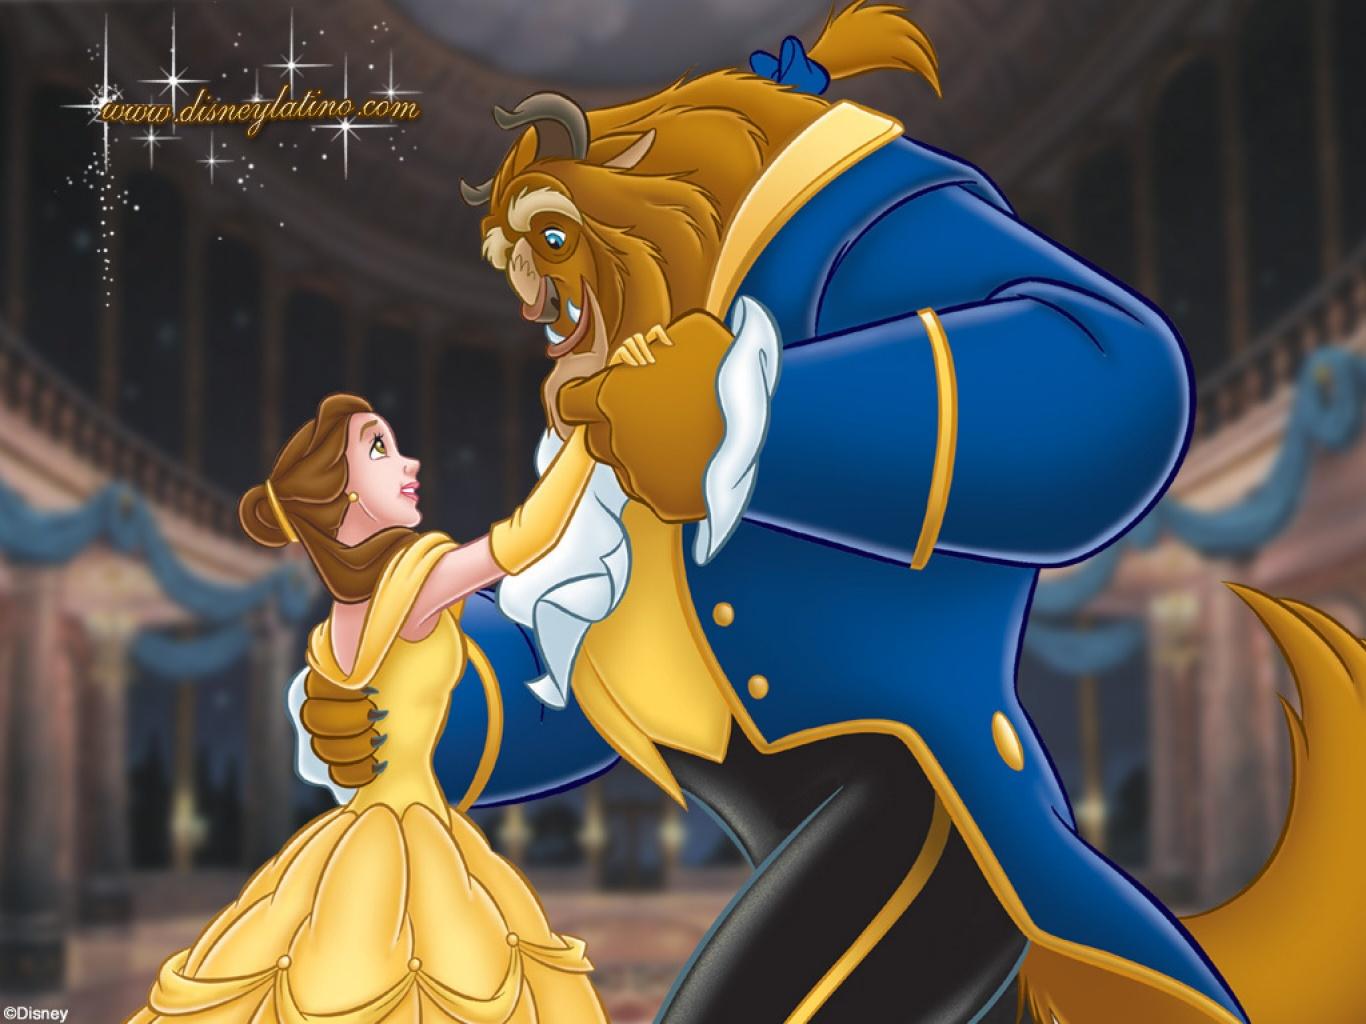 Beauty And The Beast Cartoon Wallpaper: Fotos De Disney: La Bella Y La Bestia